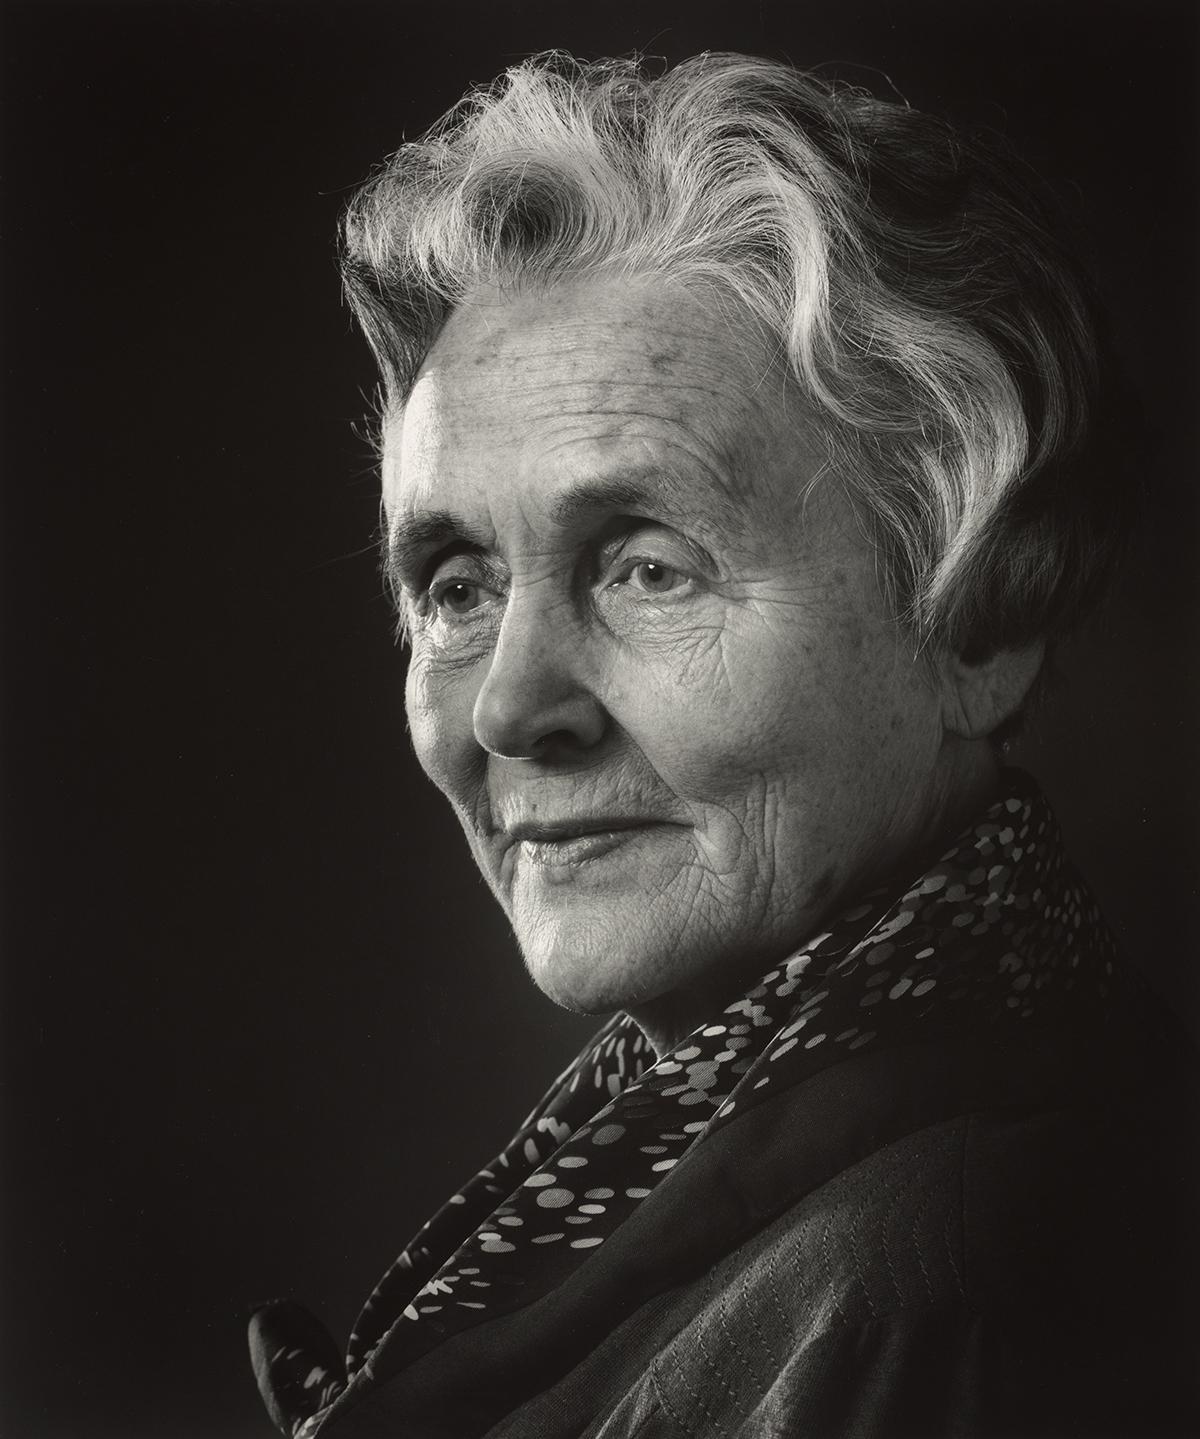 Halldis Moren Vesaas, lyriker  av Morten Krogvold. Oslo, 1983